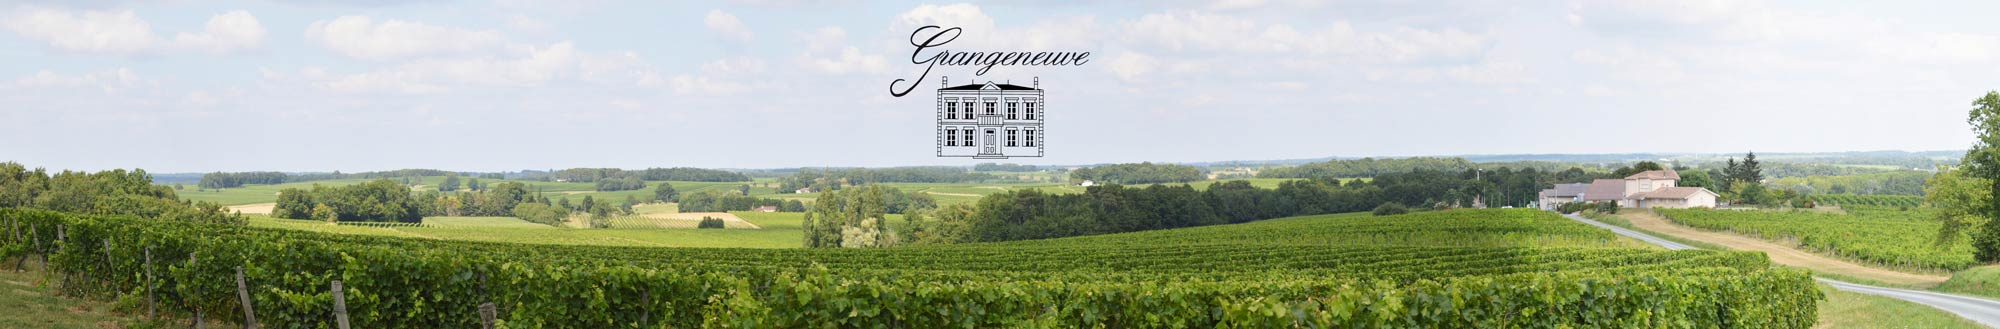 grangeneuve-paysage-logo